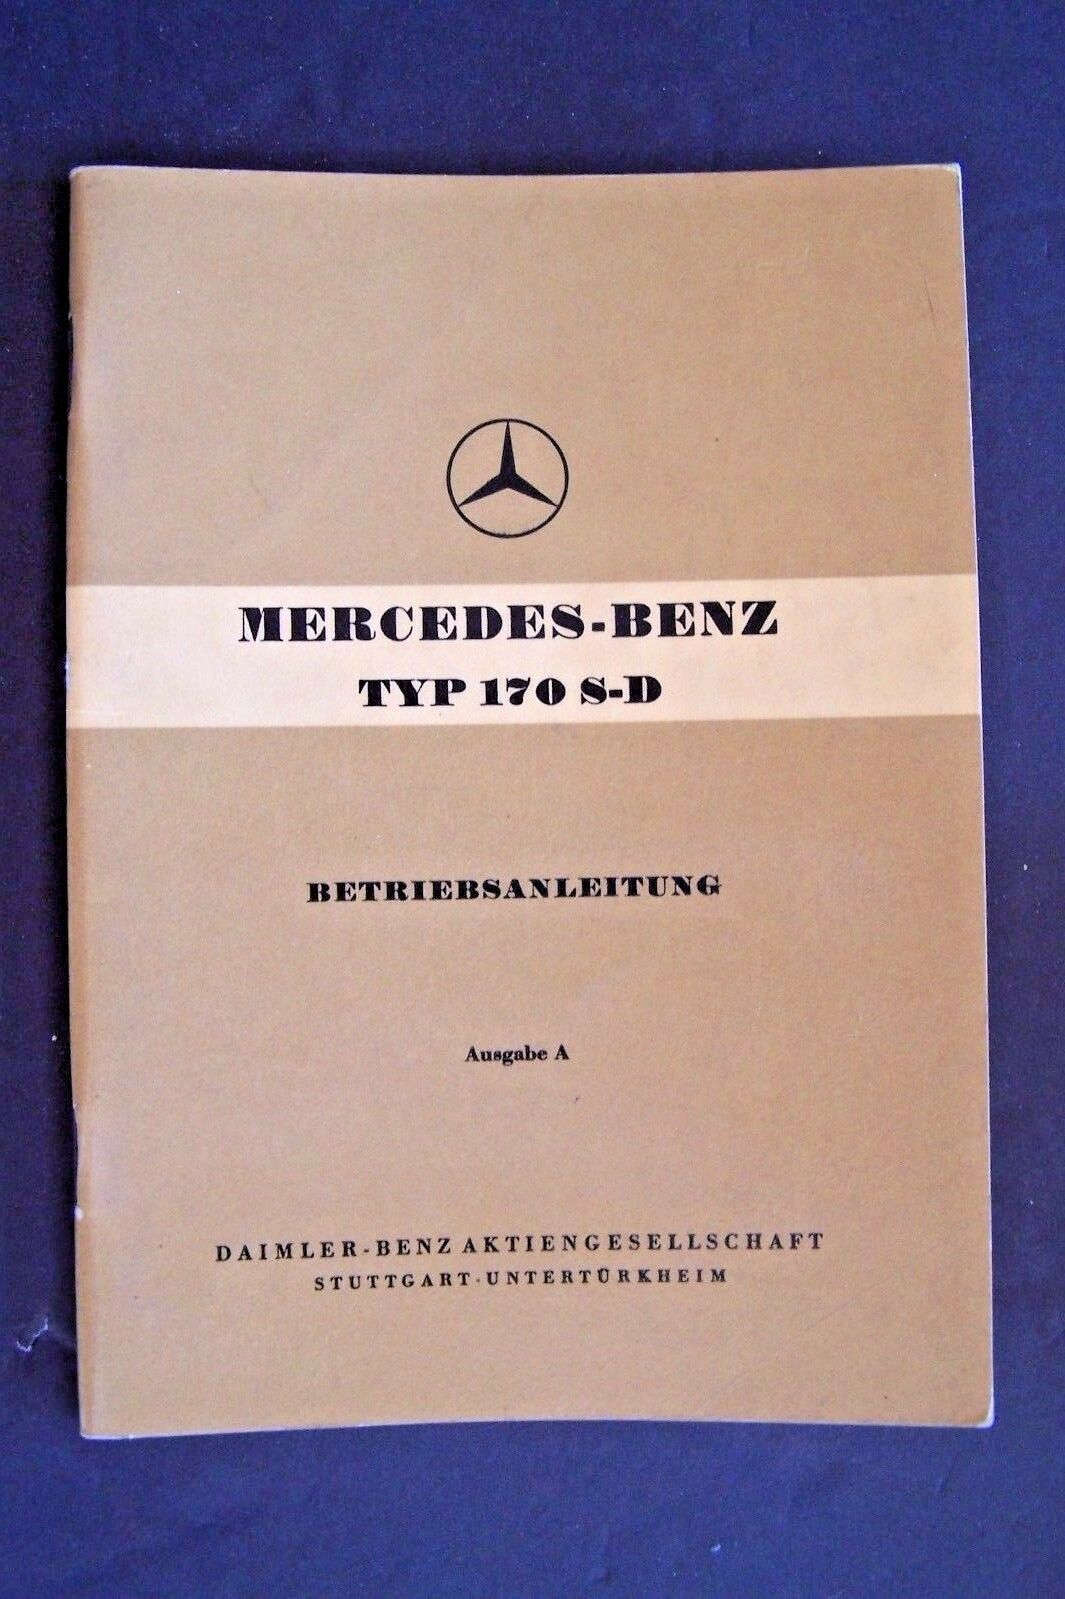 1954 mercedes 170sd w136 owners manual betriebsanleitung new german